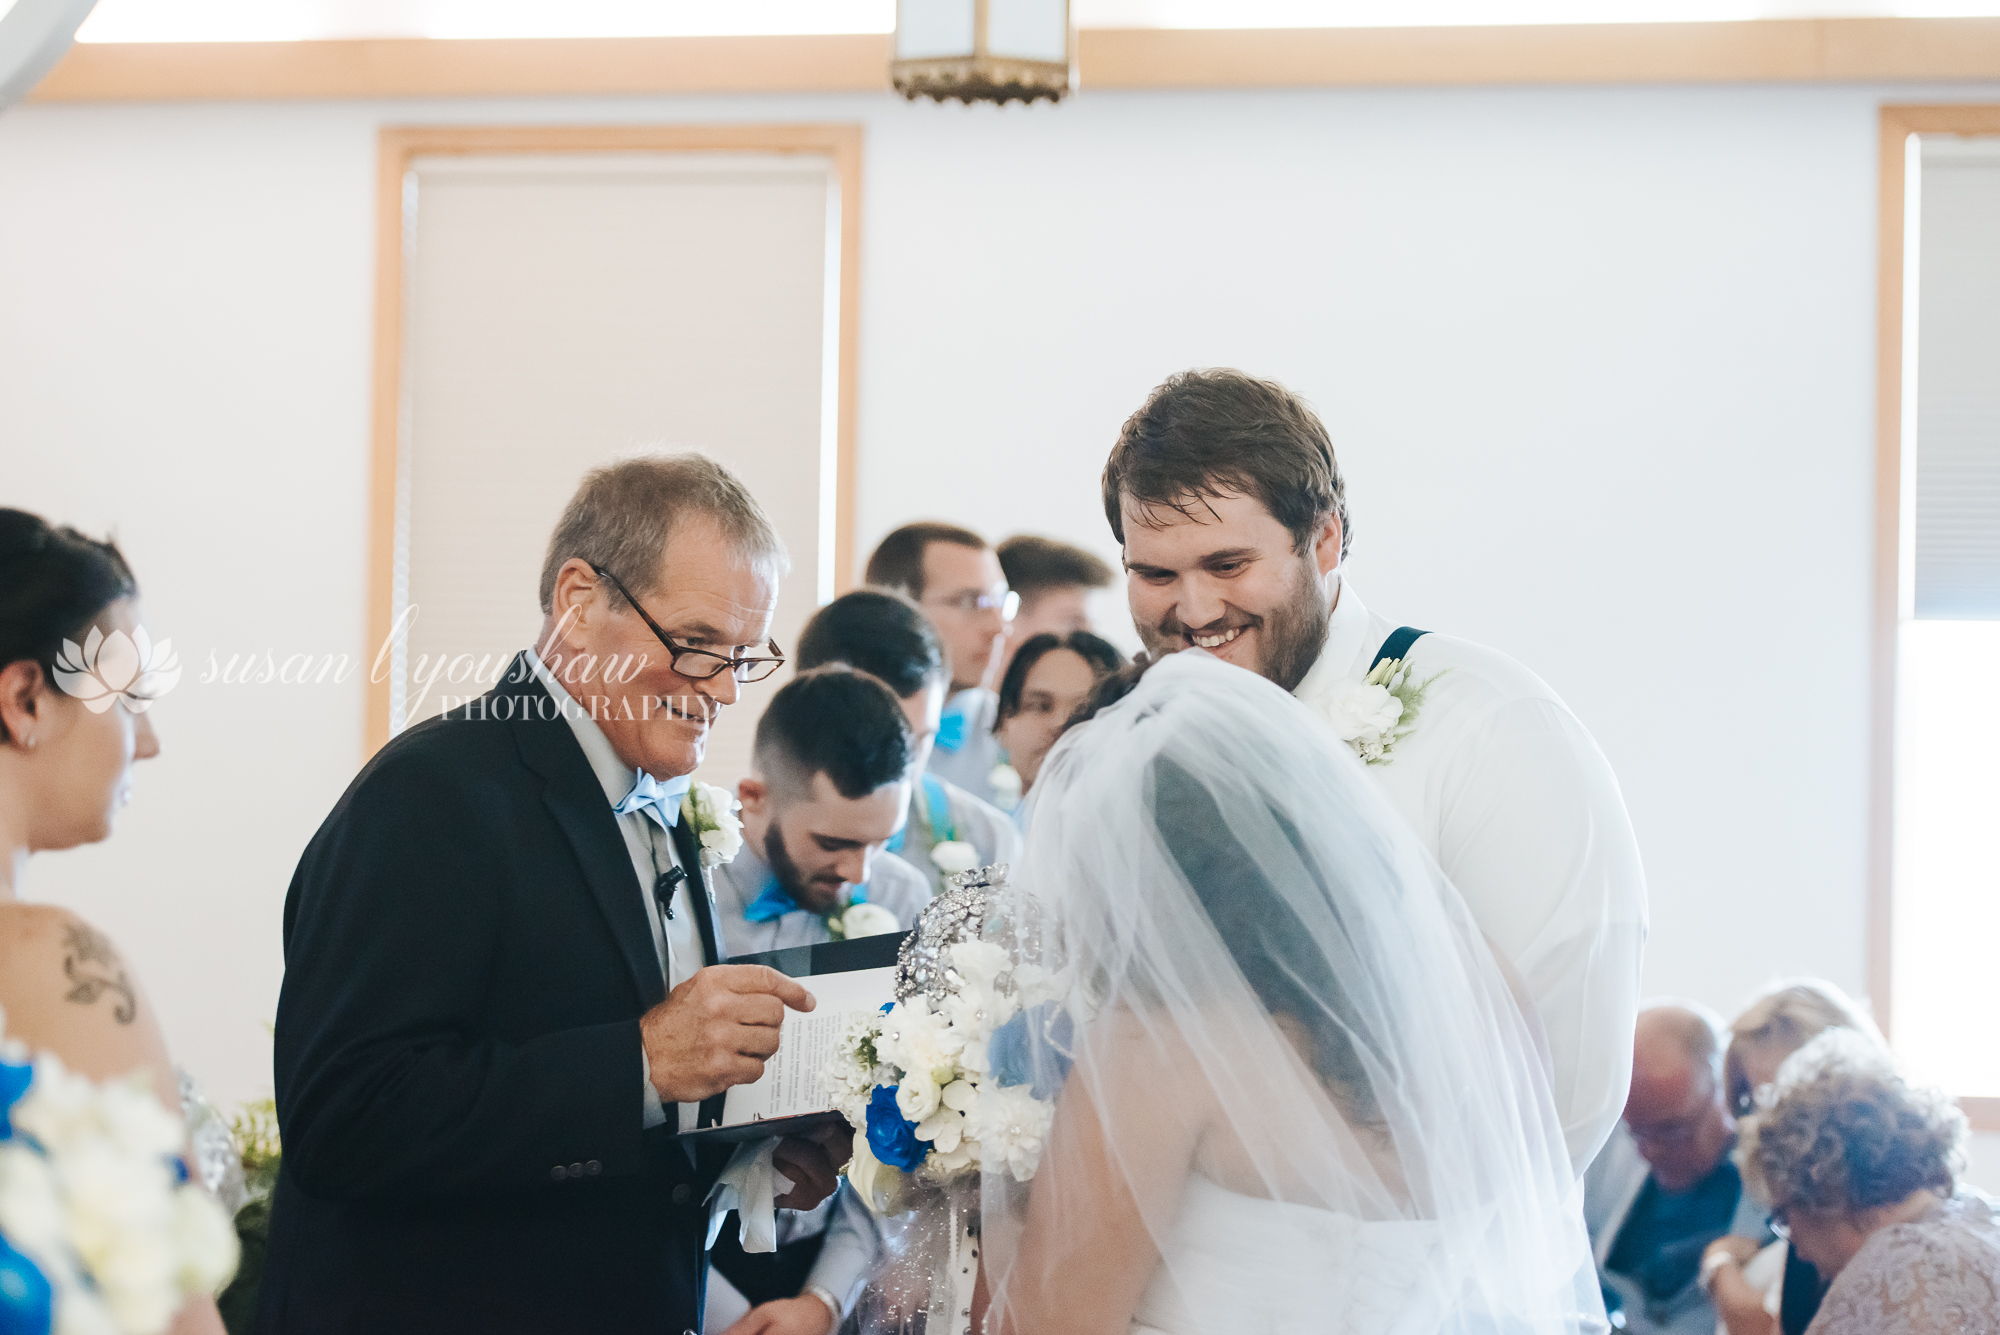 Katelyn and Wes Wedding Photos 07-13-2019 SLY Photography-62.jpg